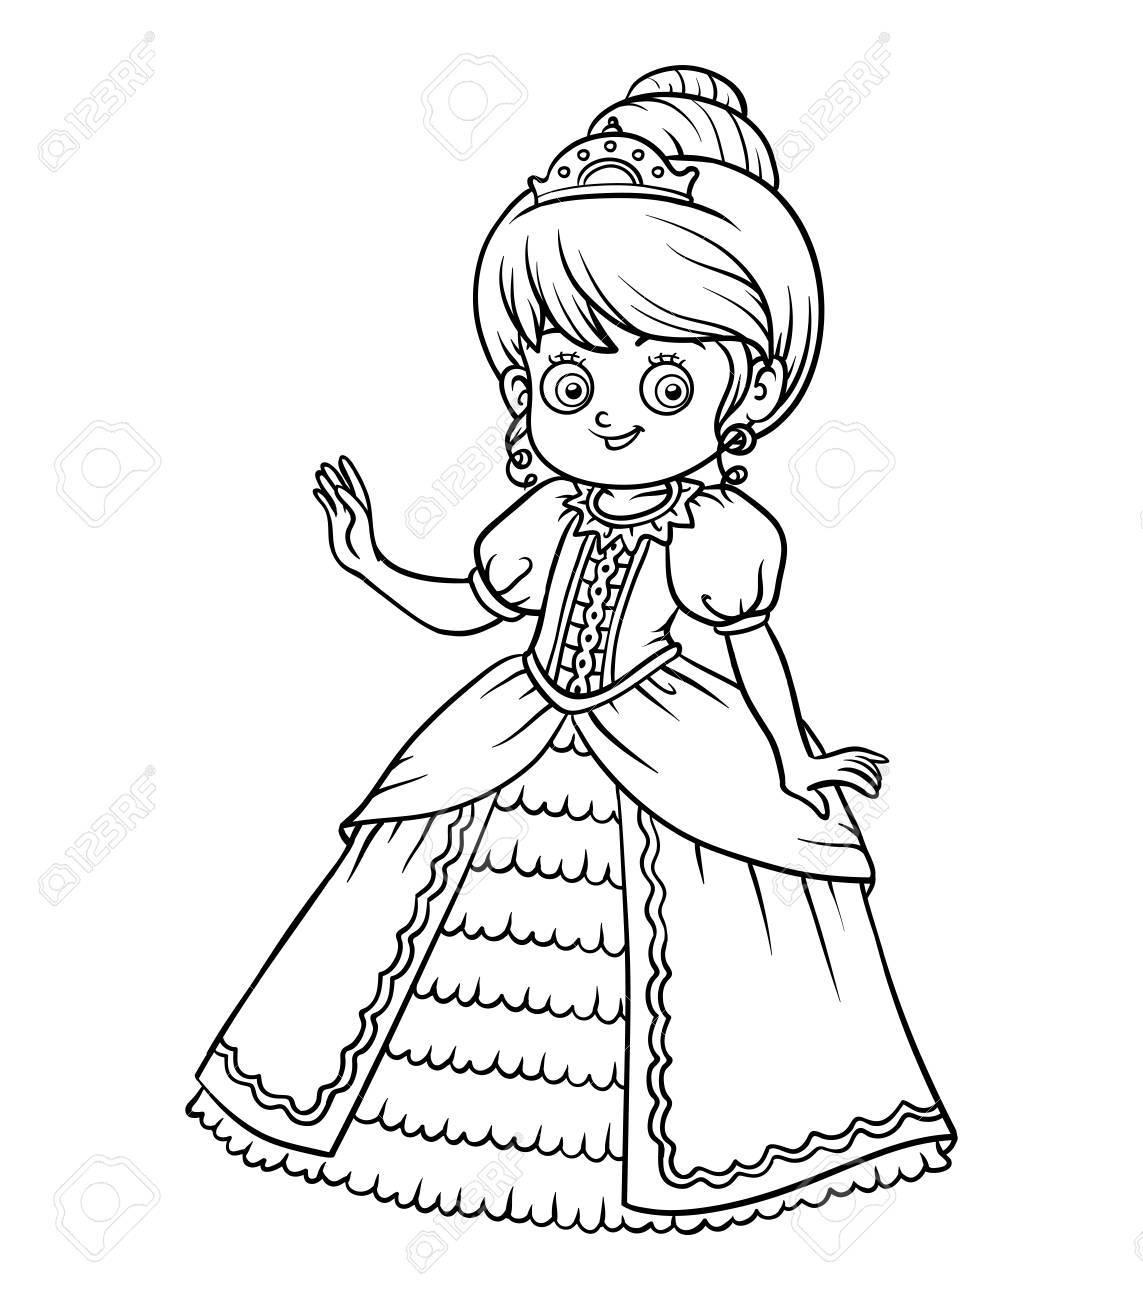 Dibujo Para Colorear Para Niños, Personaje De Dibujos Animados ...